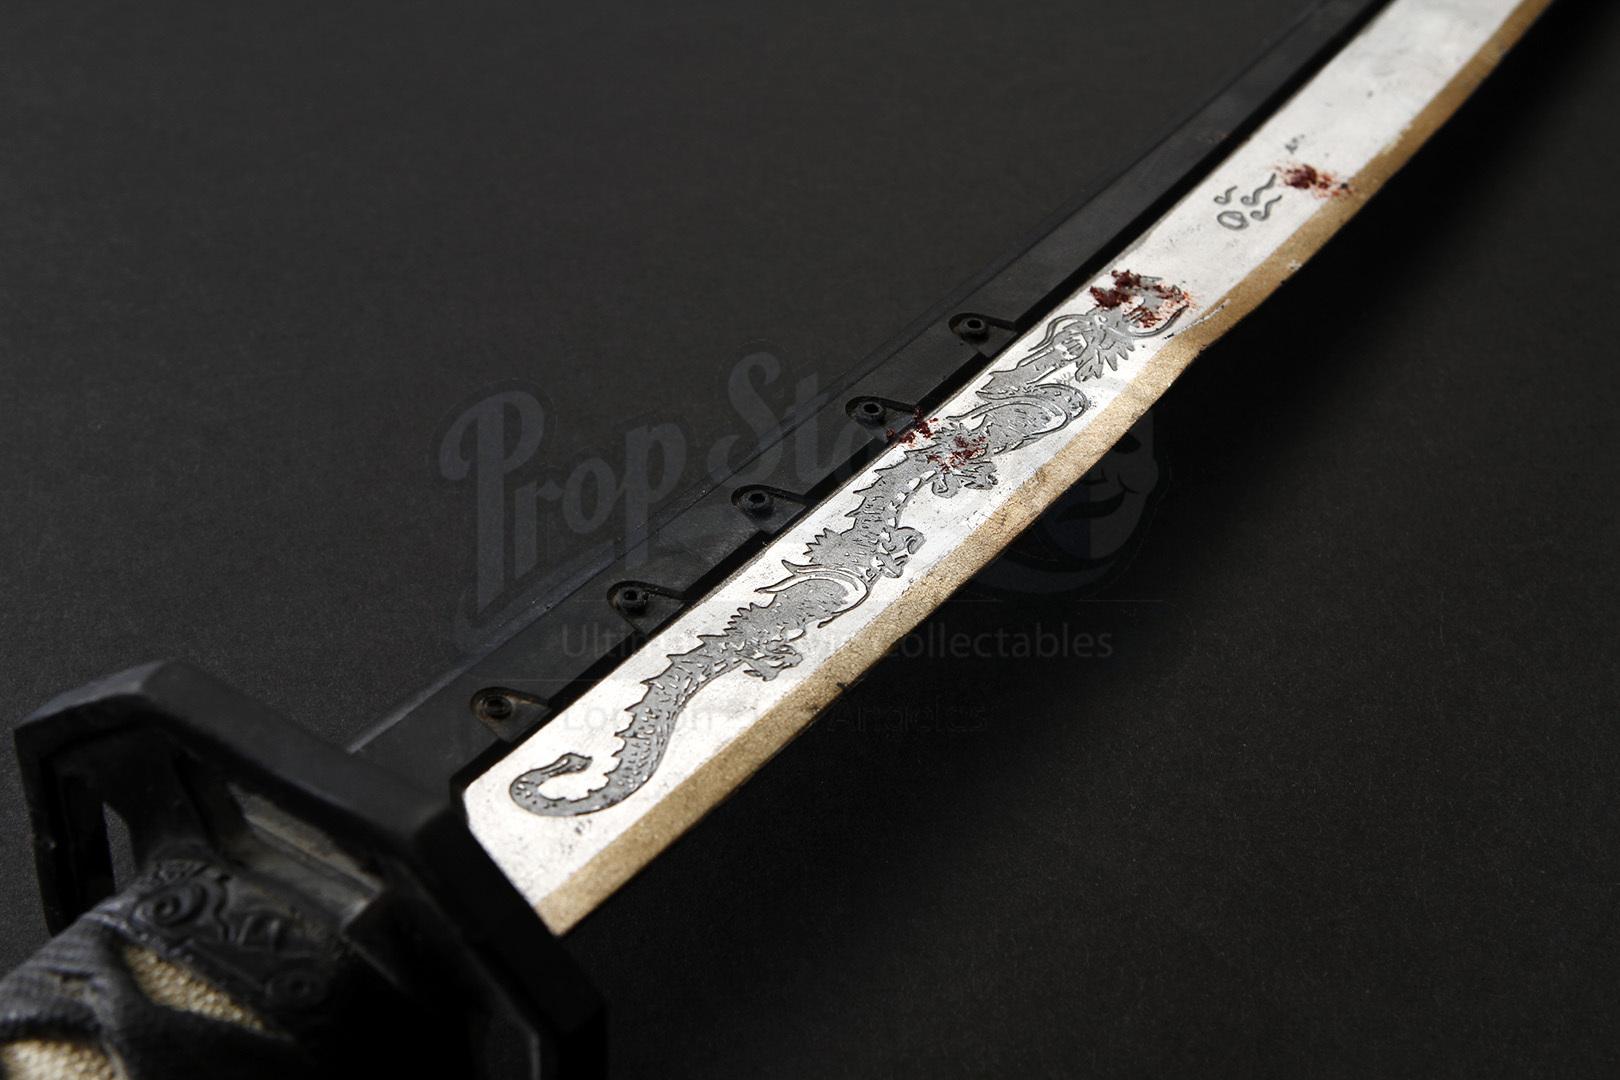 Sharlto Copley Elysium Sword